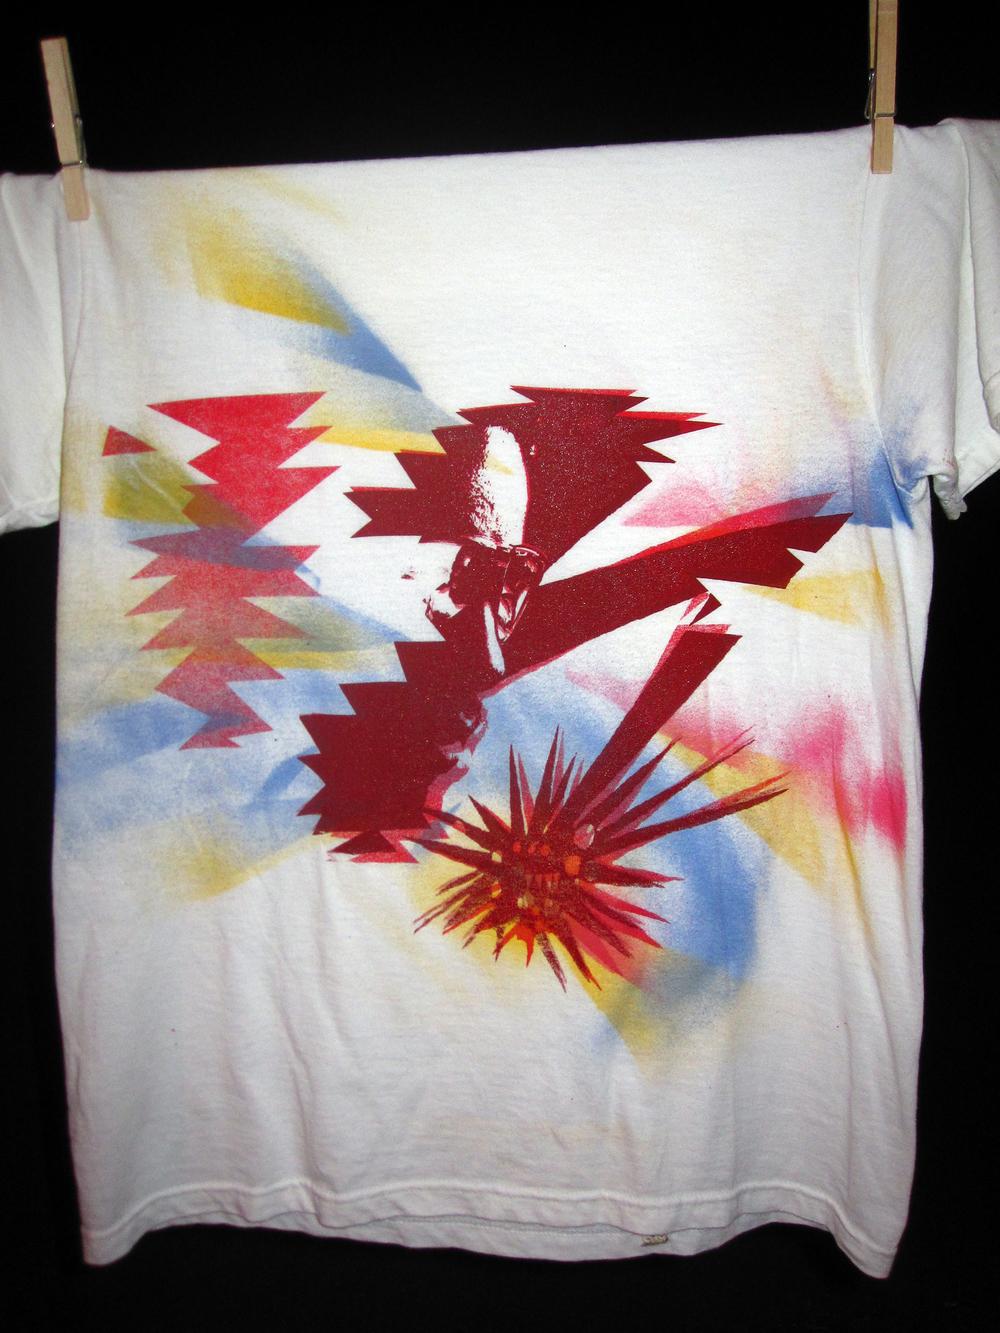 new shirts 201020100809_3160.jpg